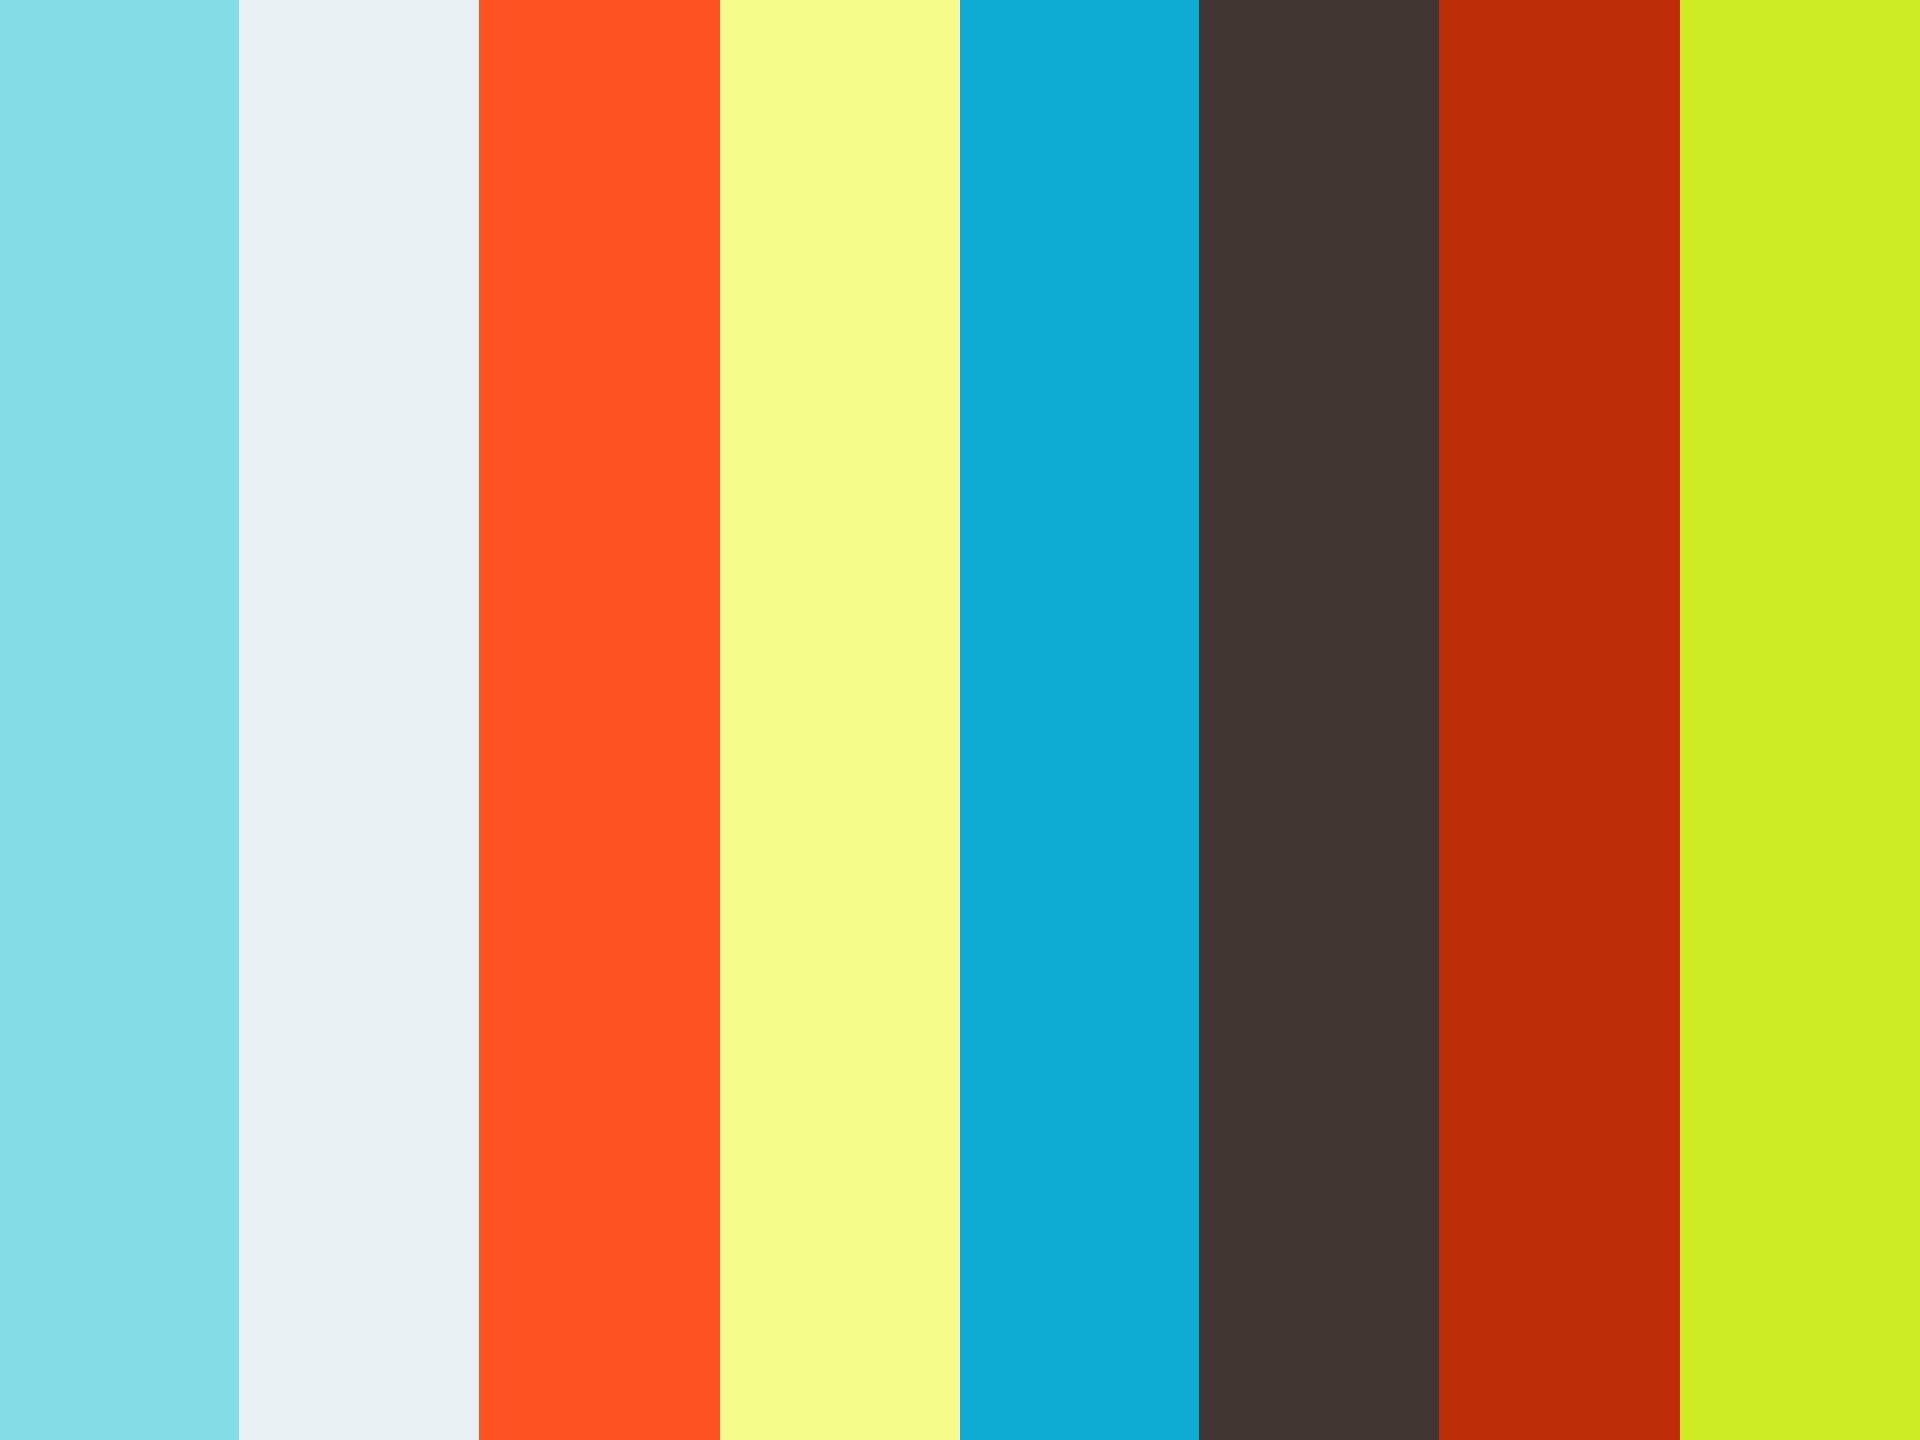 【special】内山徹哉先生:⑩クラウン修復の心臓であるプロビジョナルレストレーション 〜その役割と補綴前処置の必要性 印象採得法まで〜 #7